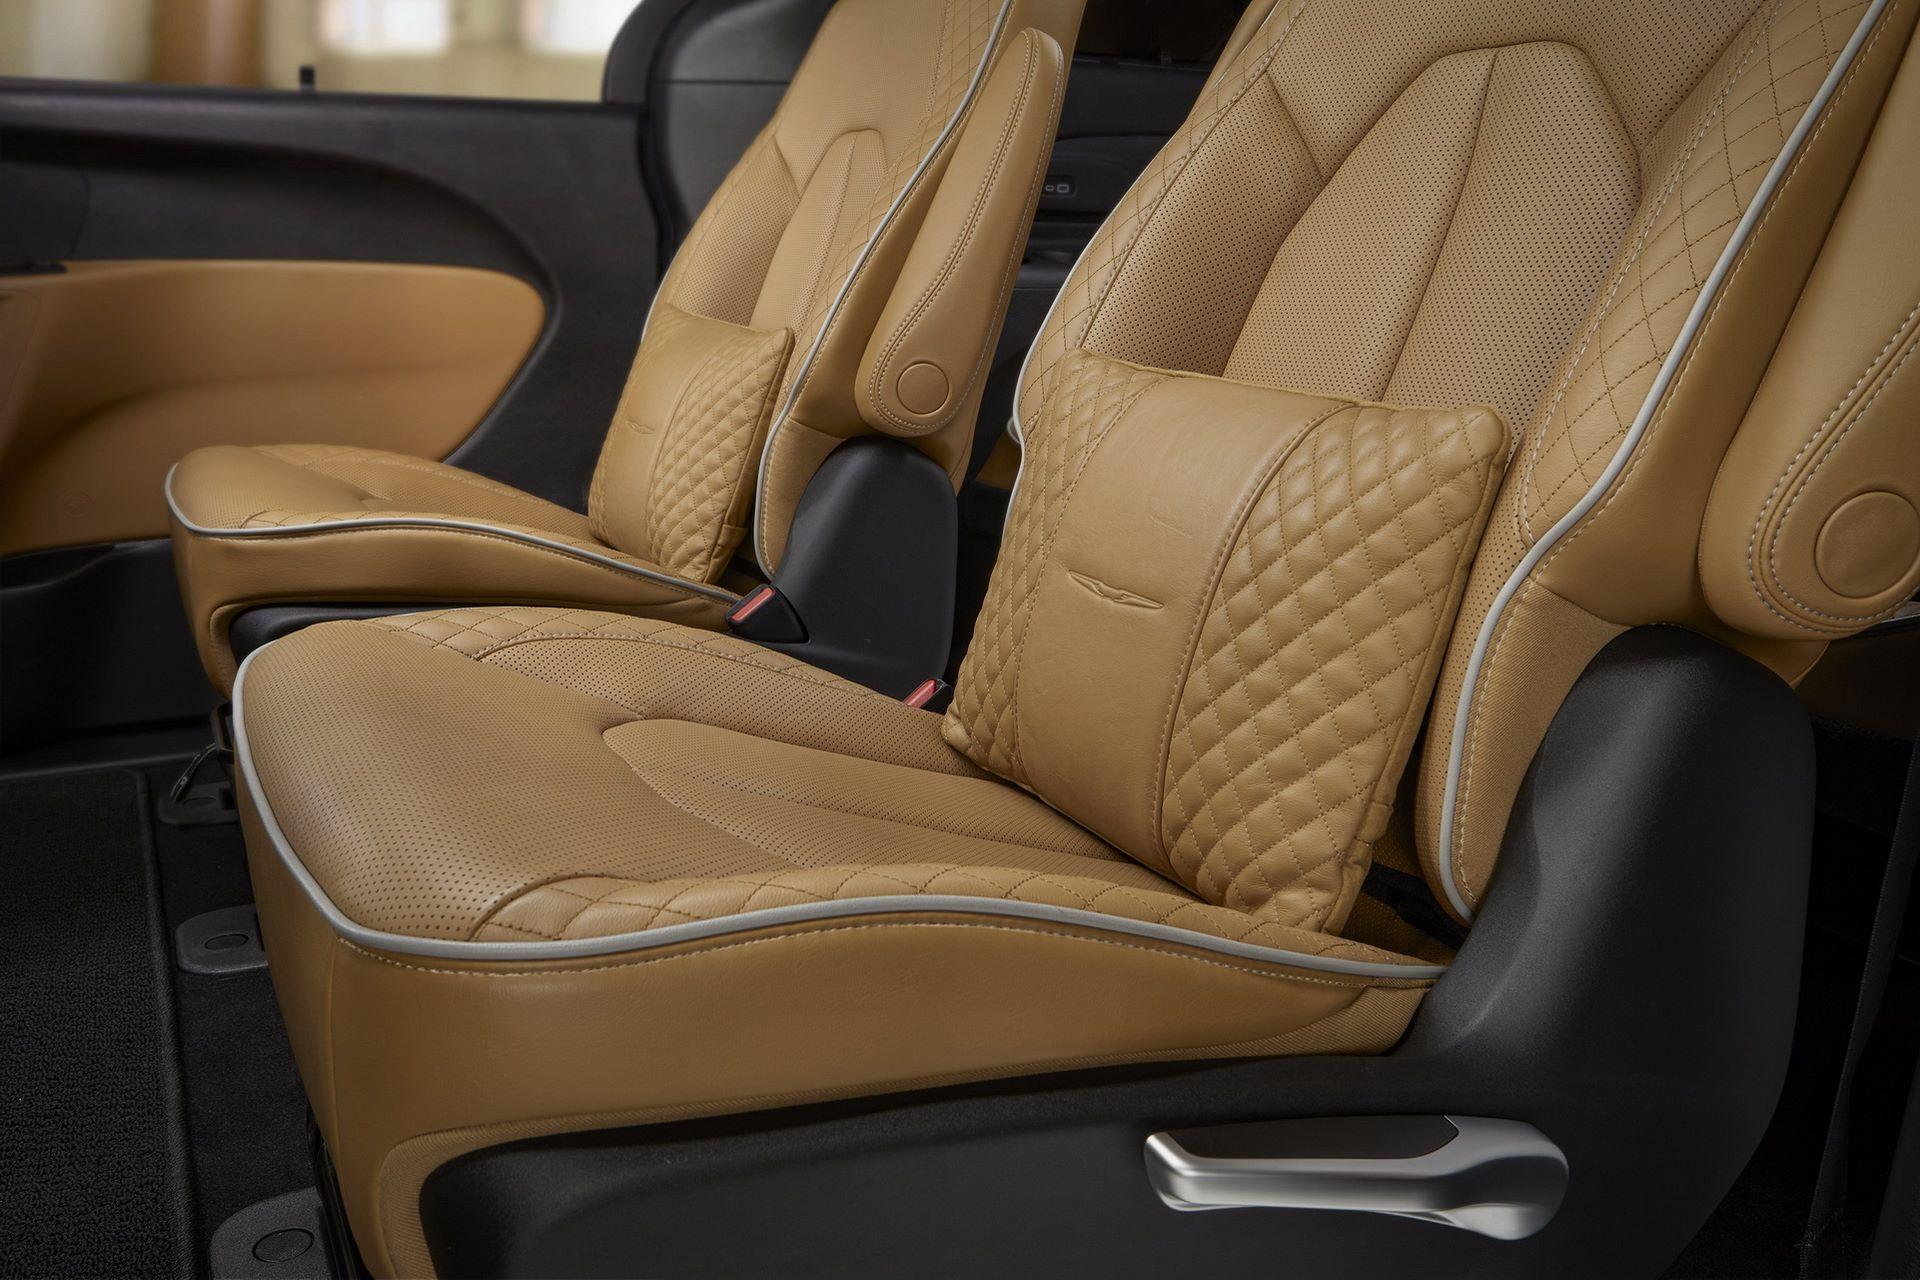 2021-Chrysler-Pacifica-68